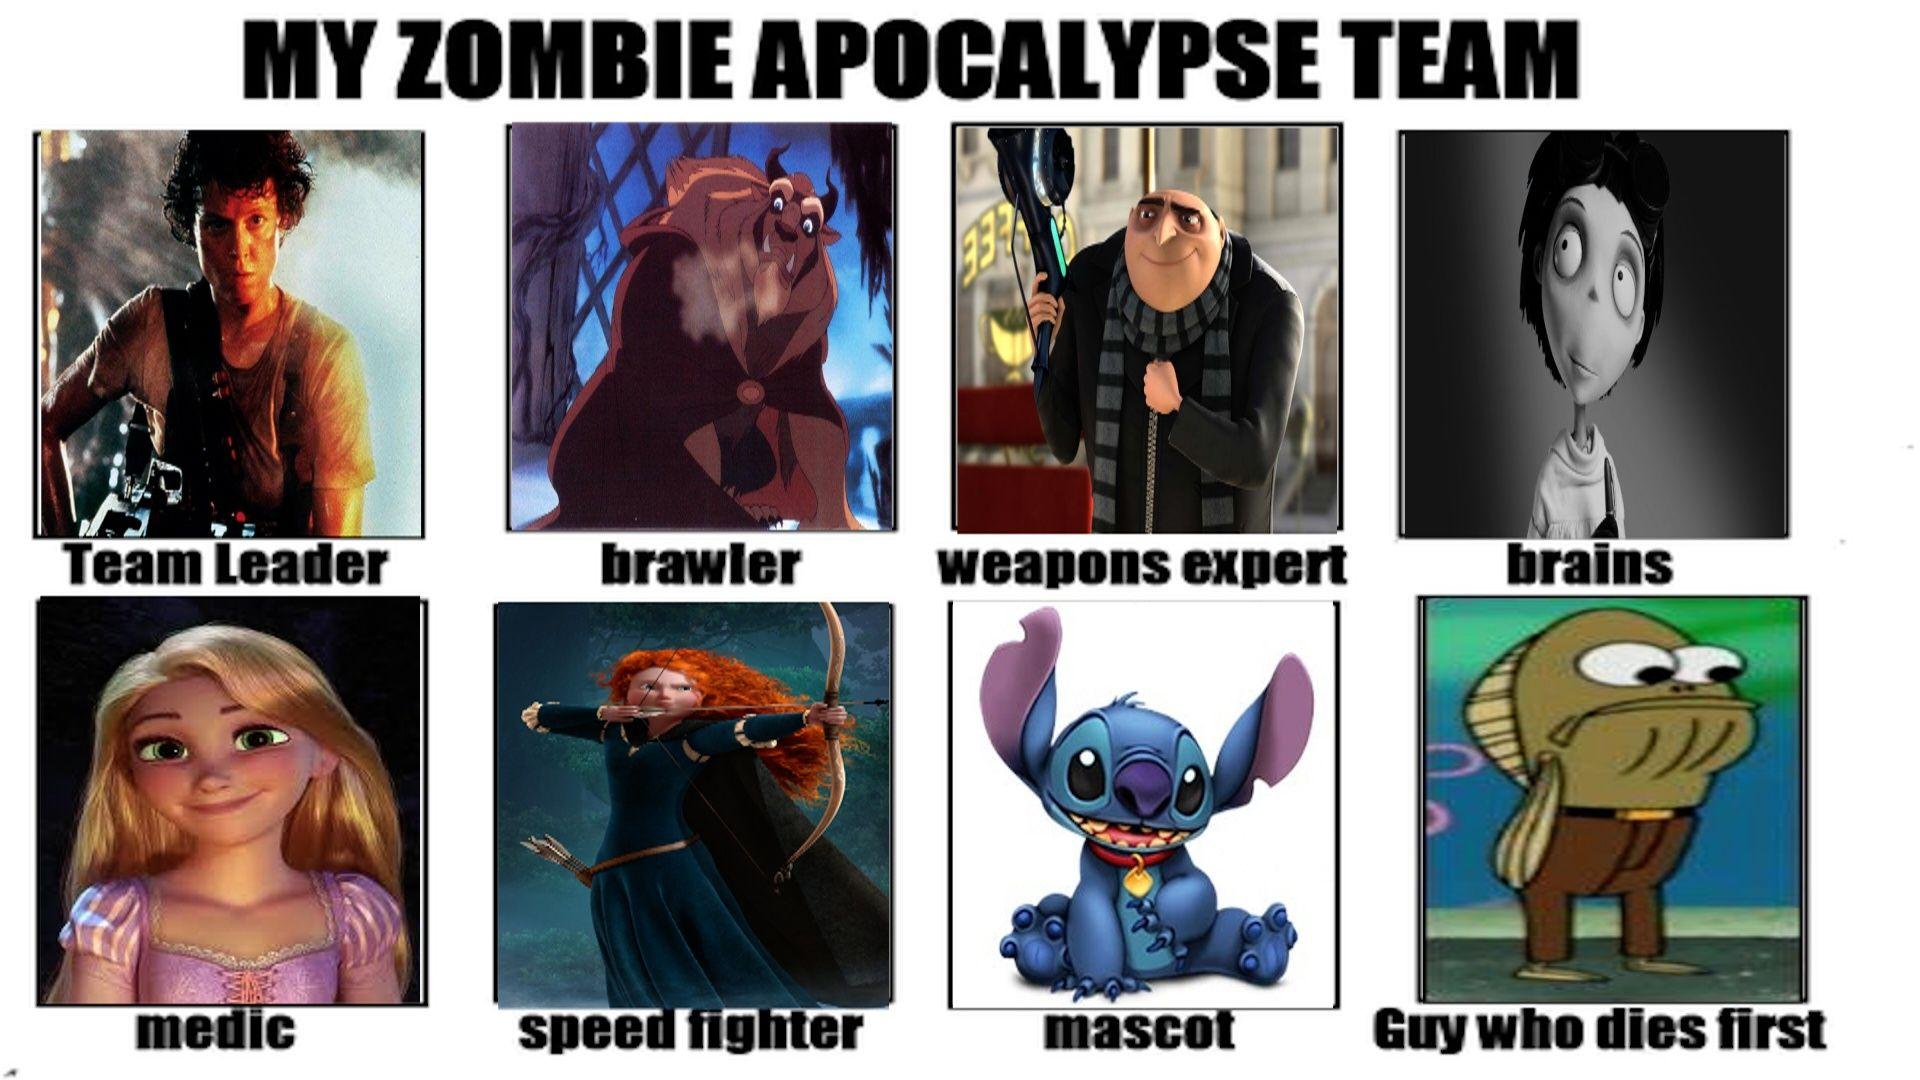 My Zombie Apocalypse Team Meme Zombie Apocalypse Team Zombie Apocalypse Apocalypse